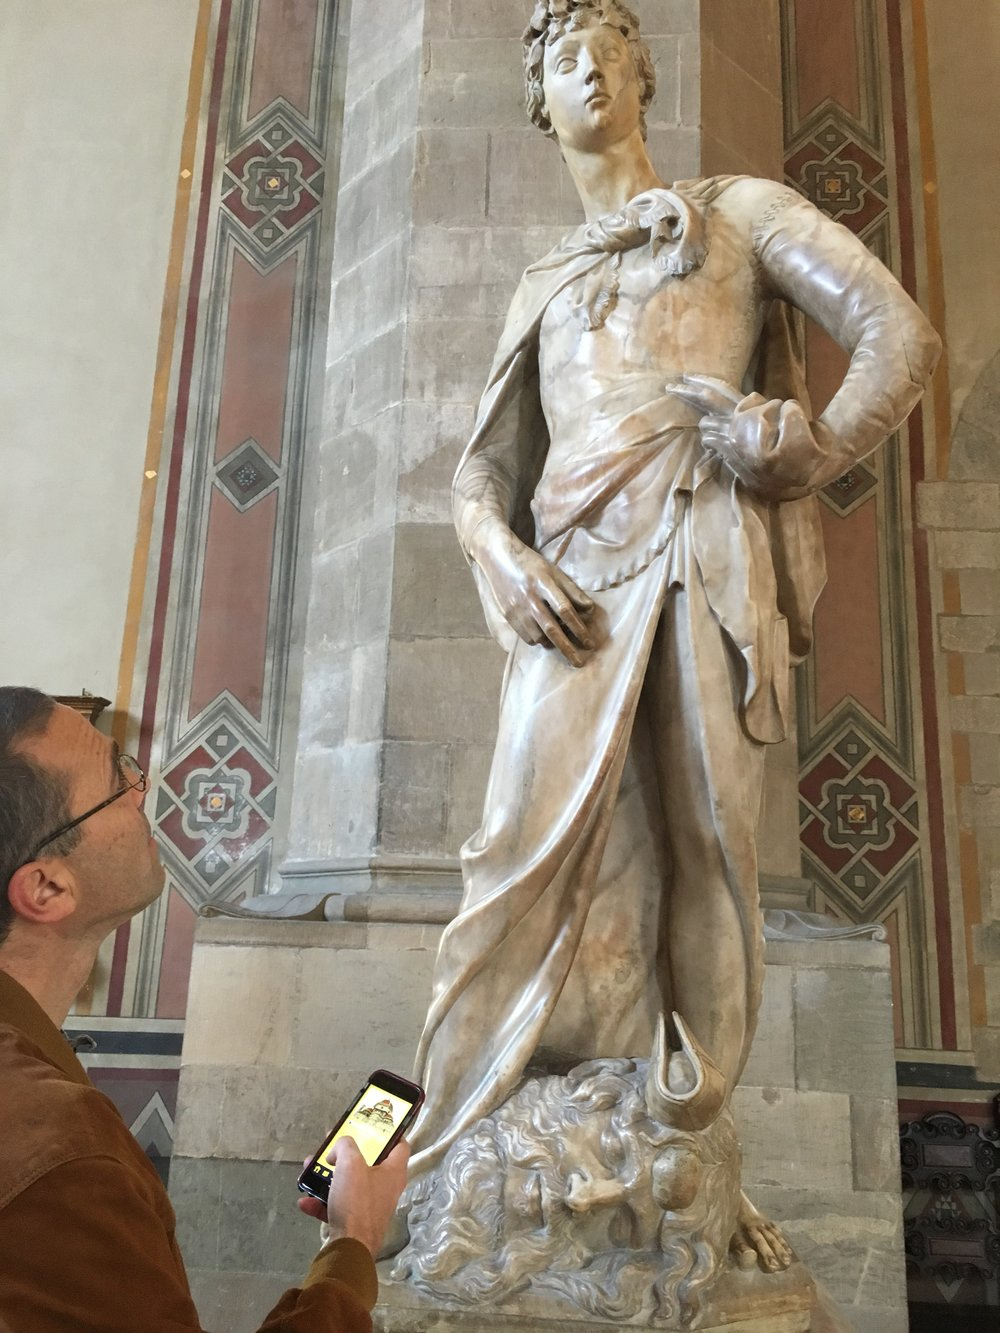 Donatello's Marble David